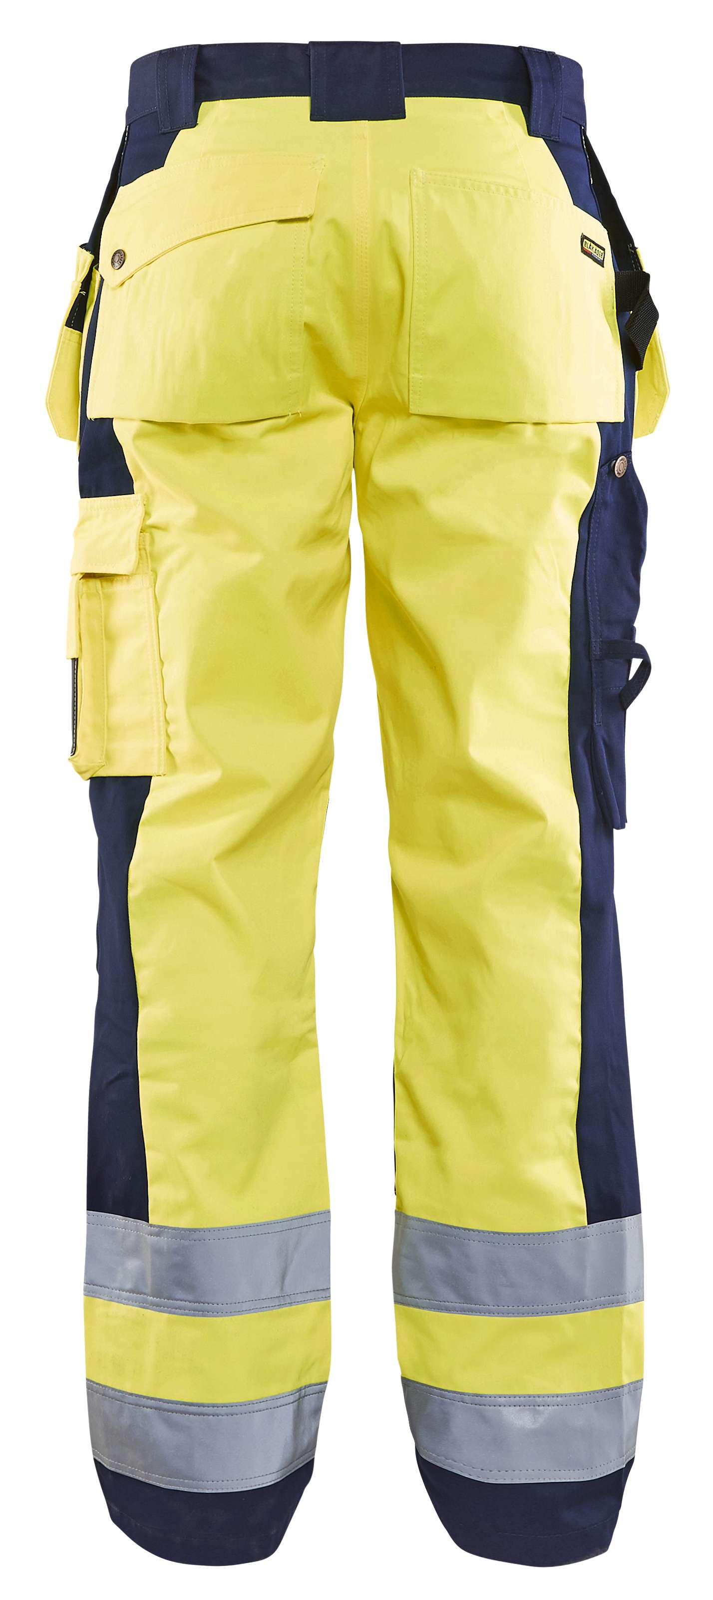 Blaklader Werkbroeken 15331860 High Vis geel-marineblauw(3389)